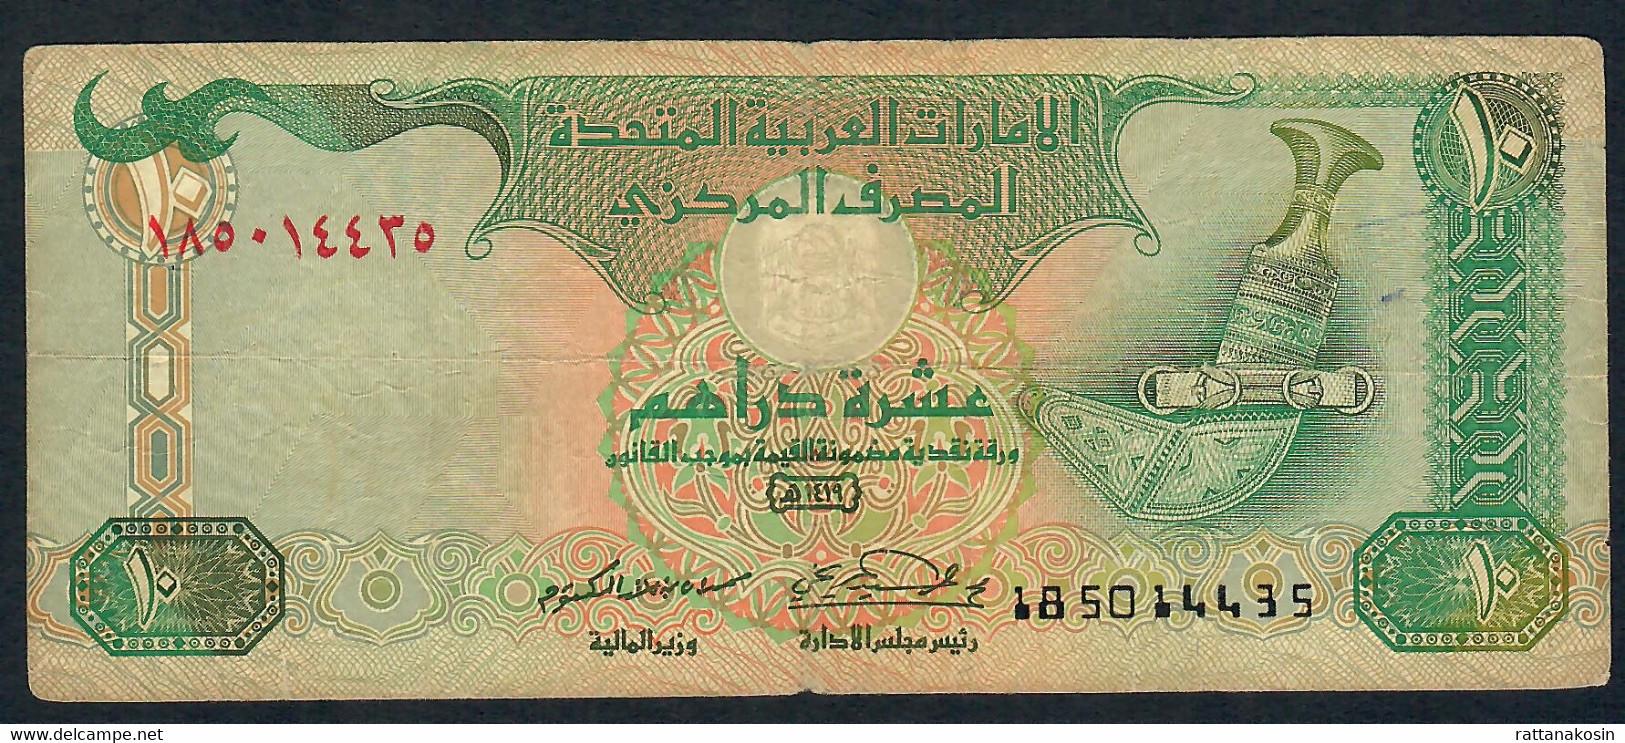 U.A.E. EMIRATS ARABES UNIS P20a 10 DIRHAMS 1998 FINE - Emirats Arabes Unis